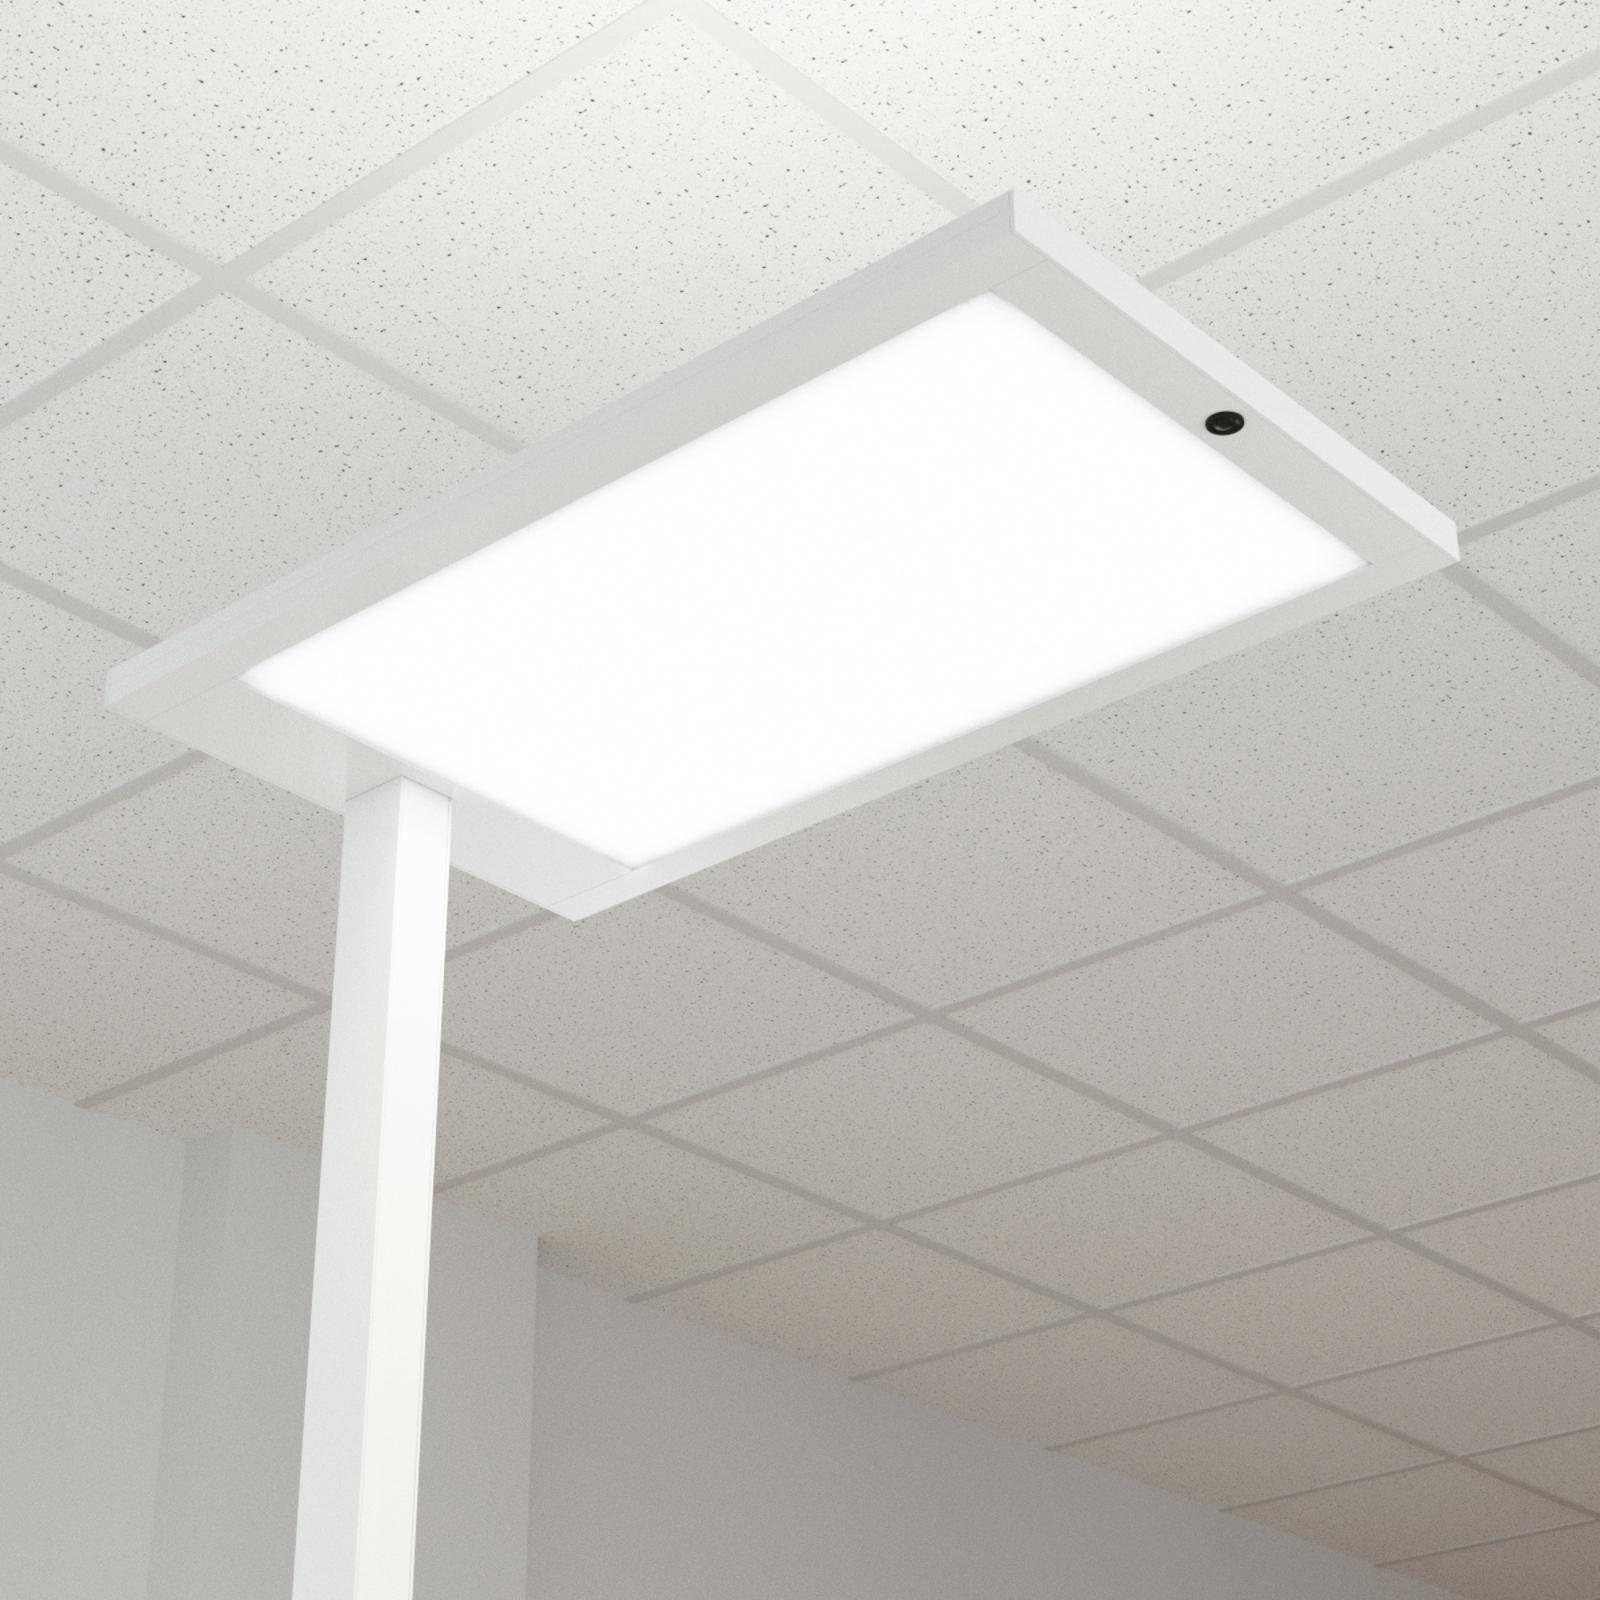 LED office floor lamp Almira with dimmer, white_3056017_1